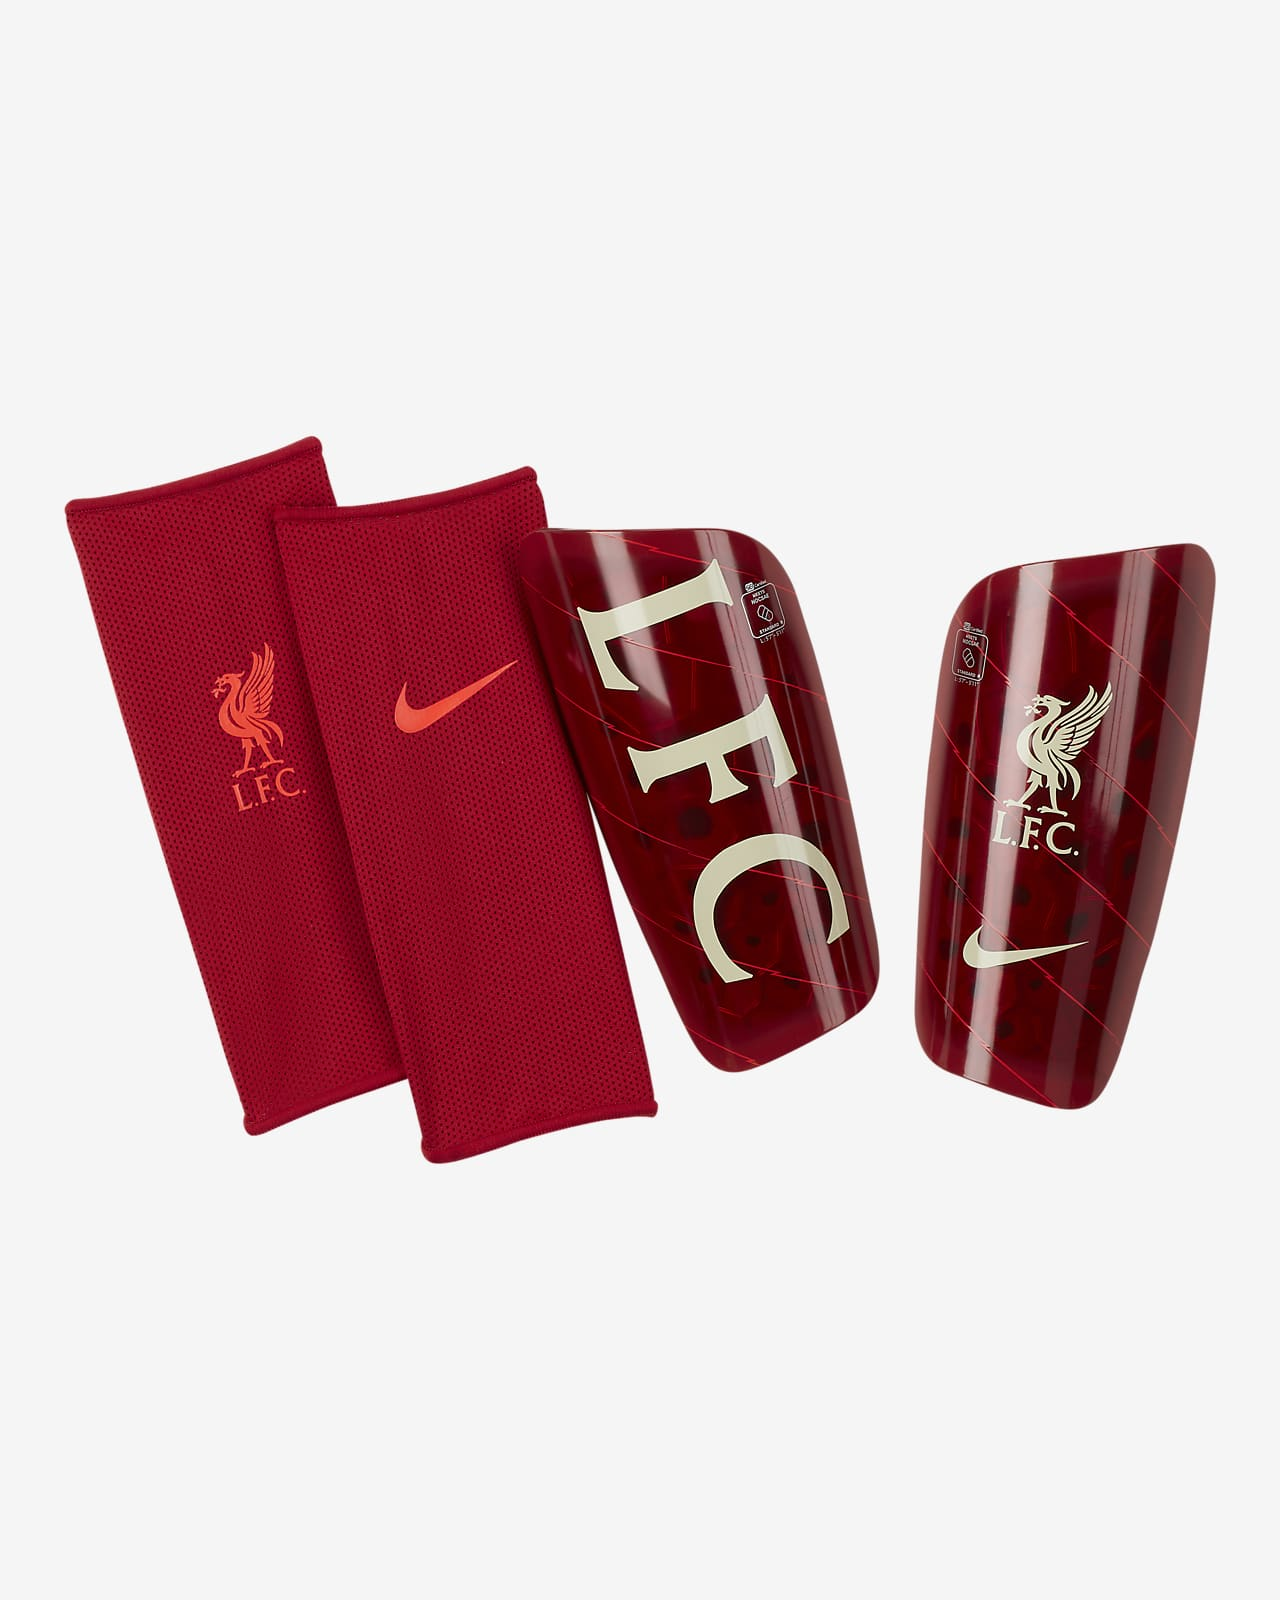 Protège-tibias de football Liverpool FC Mercurial Lite